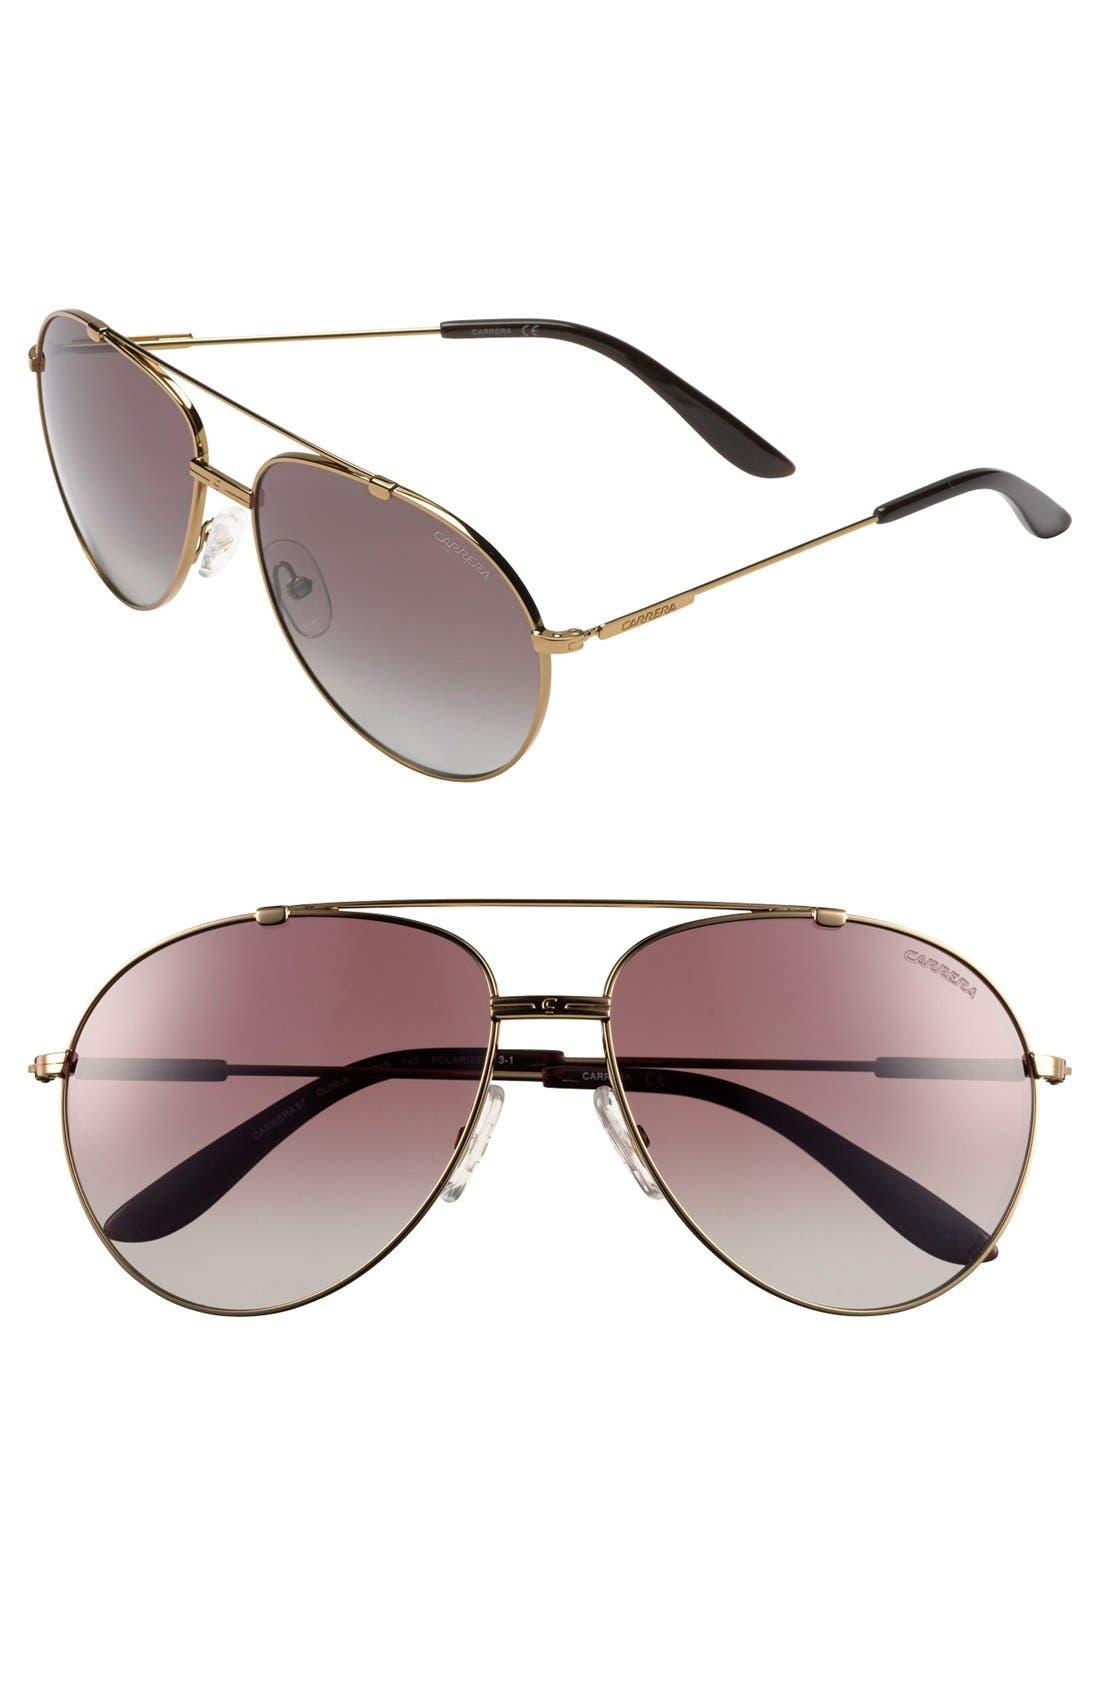 Main Image - Carrera Eyewear 60mm Polarized Aviator Sunglasses